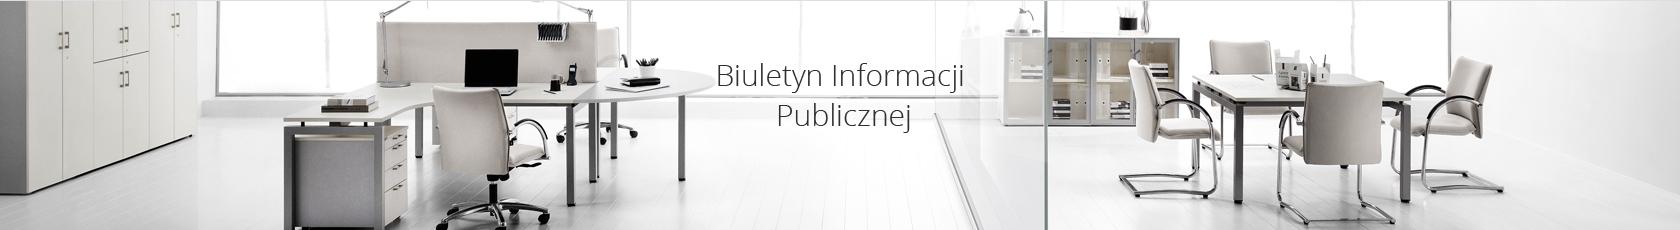 BIP - banner